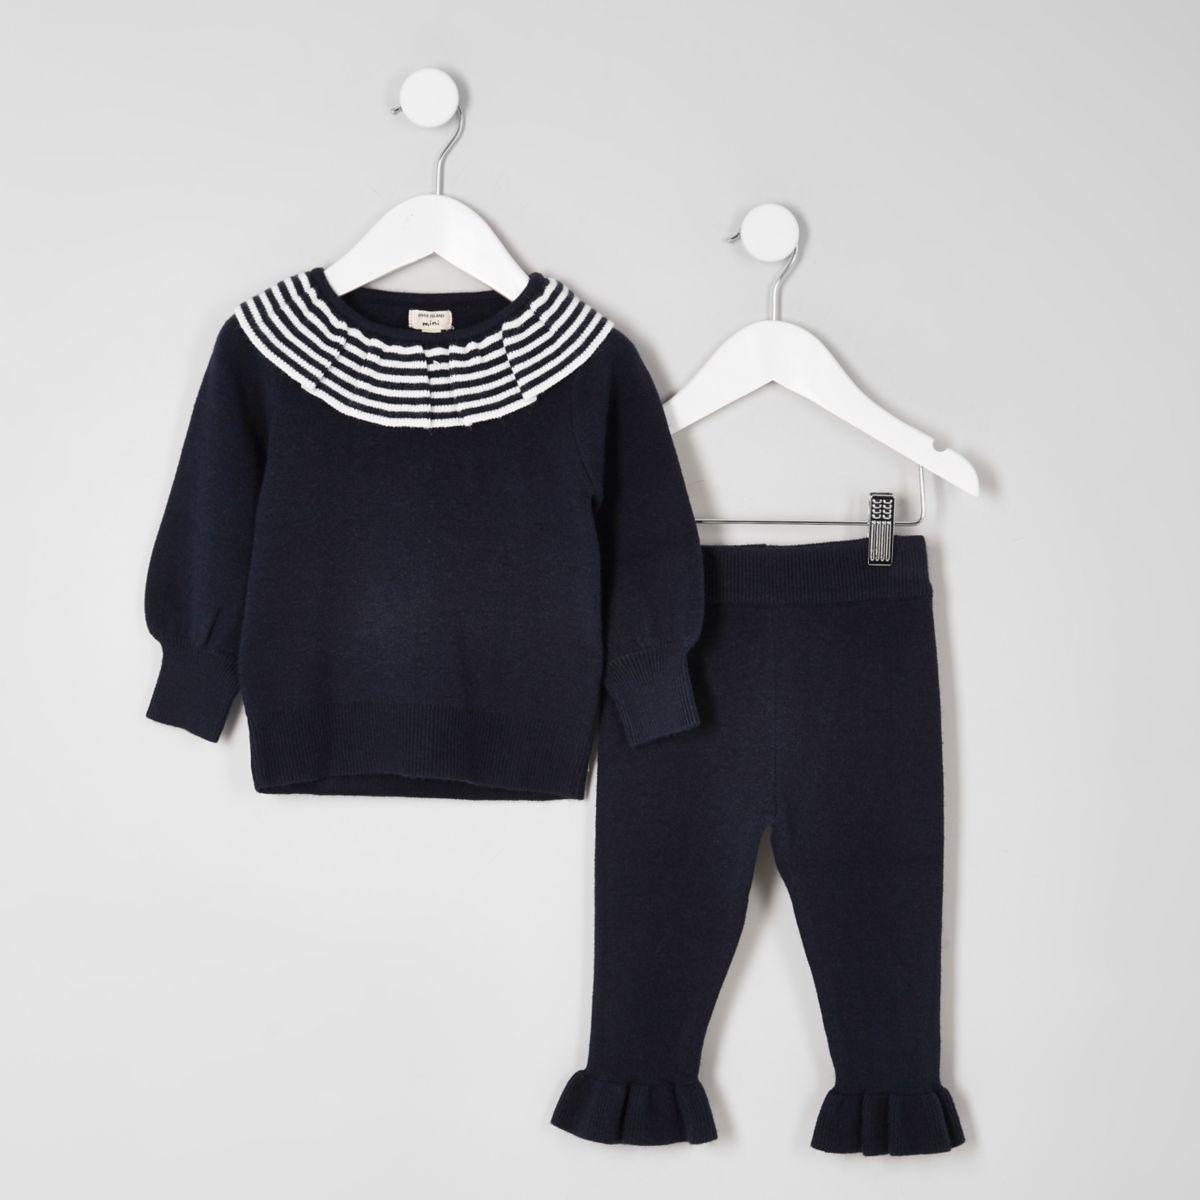 Mini girls navy knit clown collar outfit